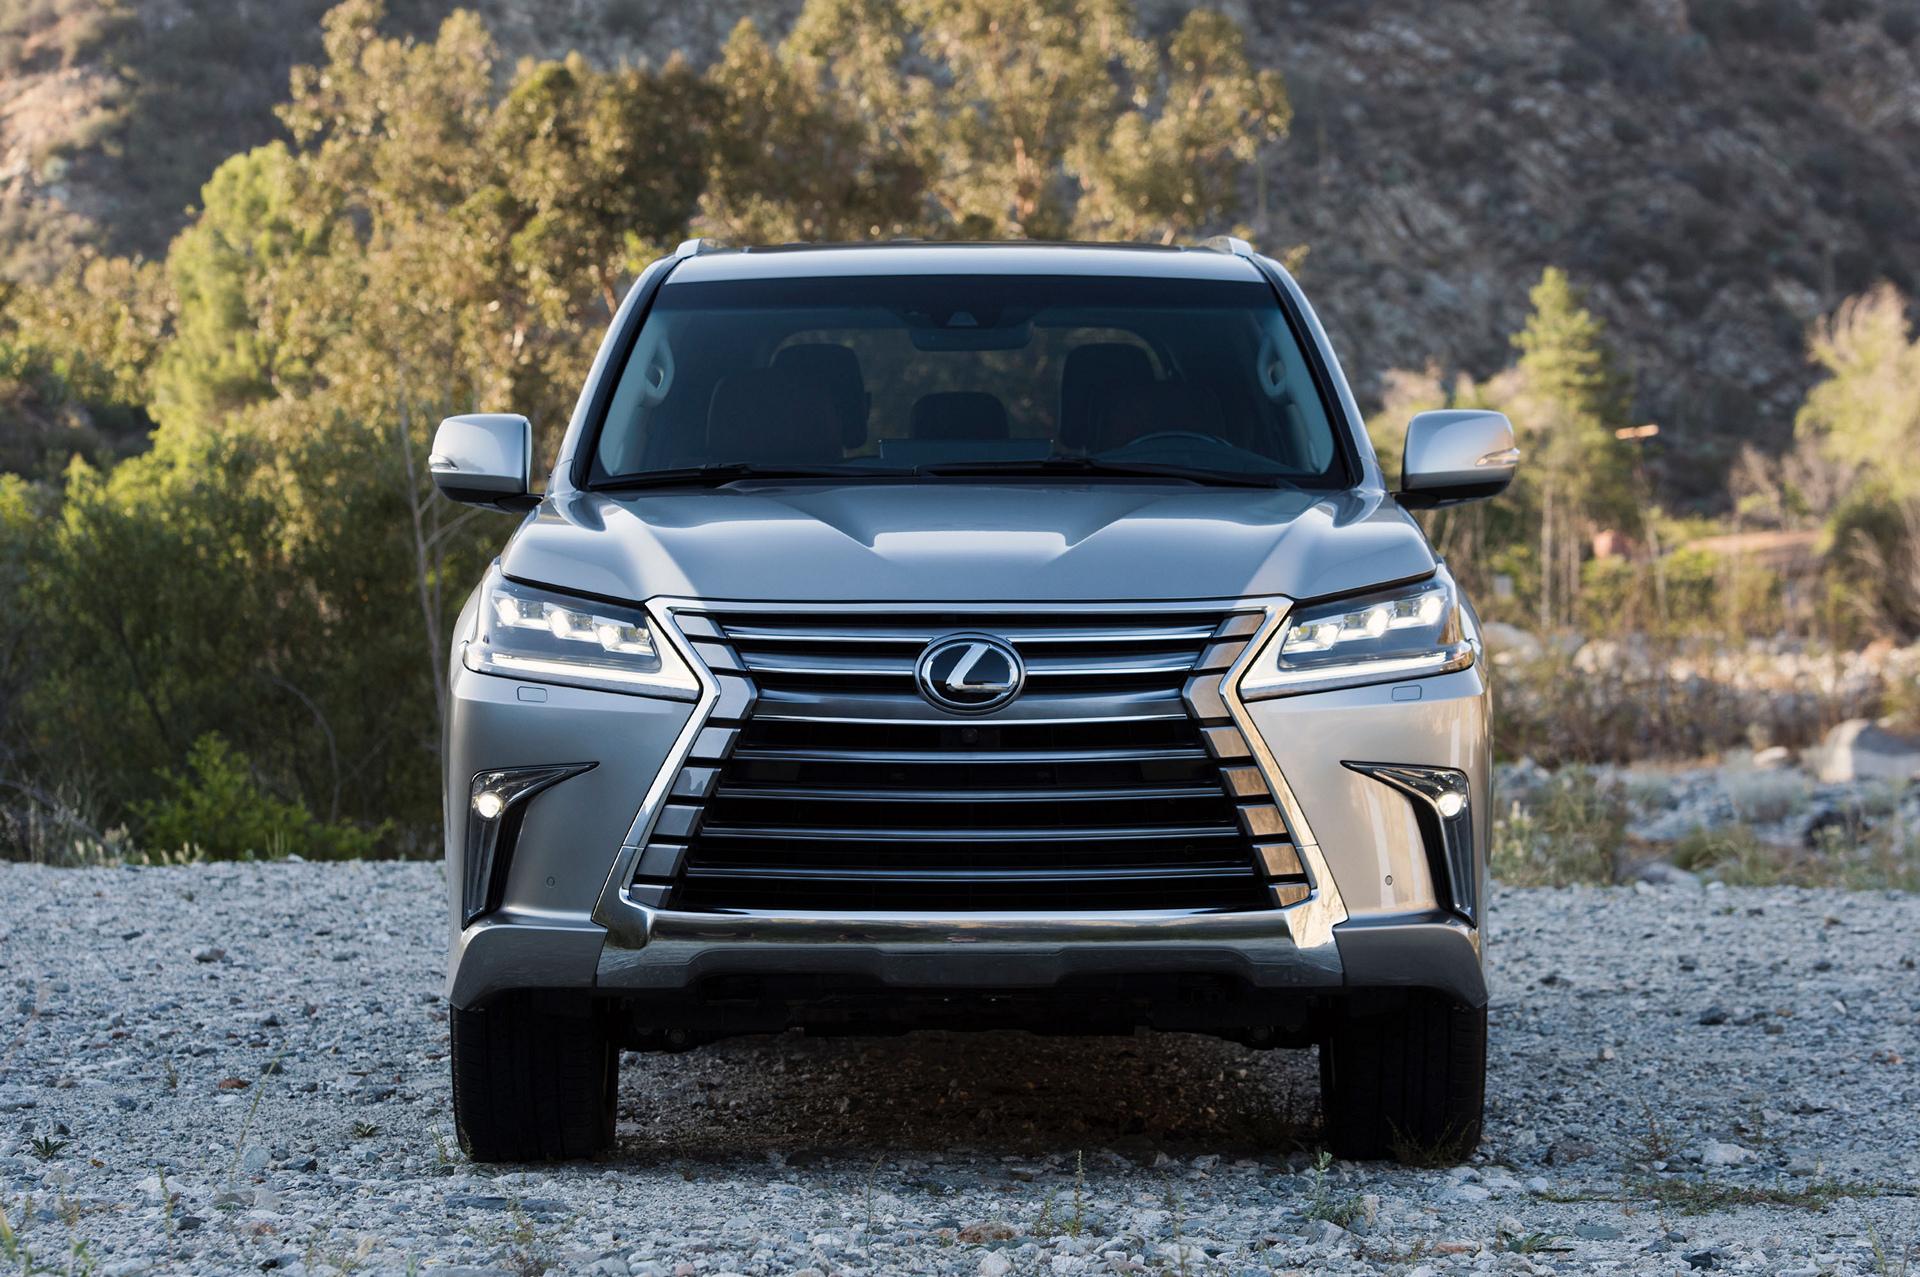 2016 Lexus LX 570 © Toyota Motor Corporation